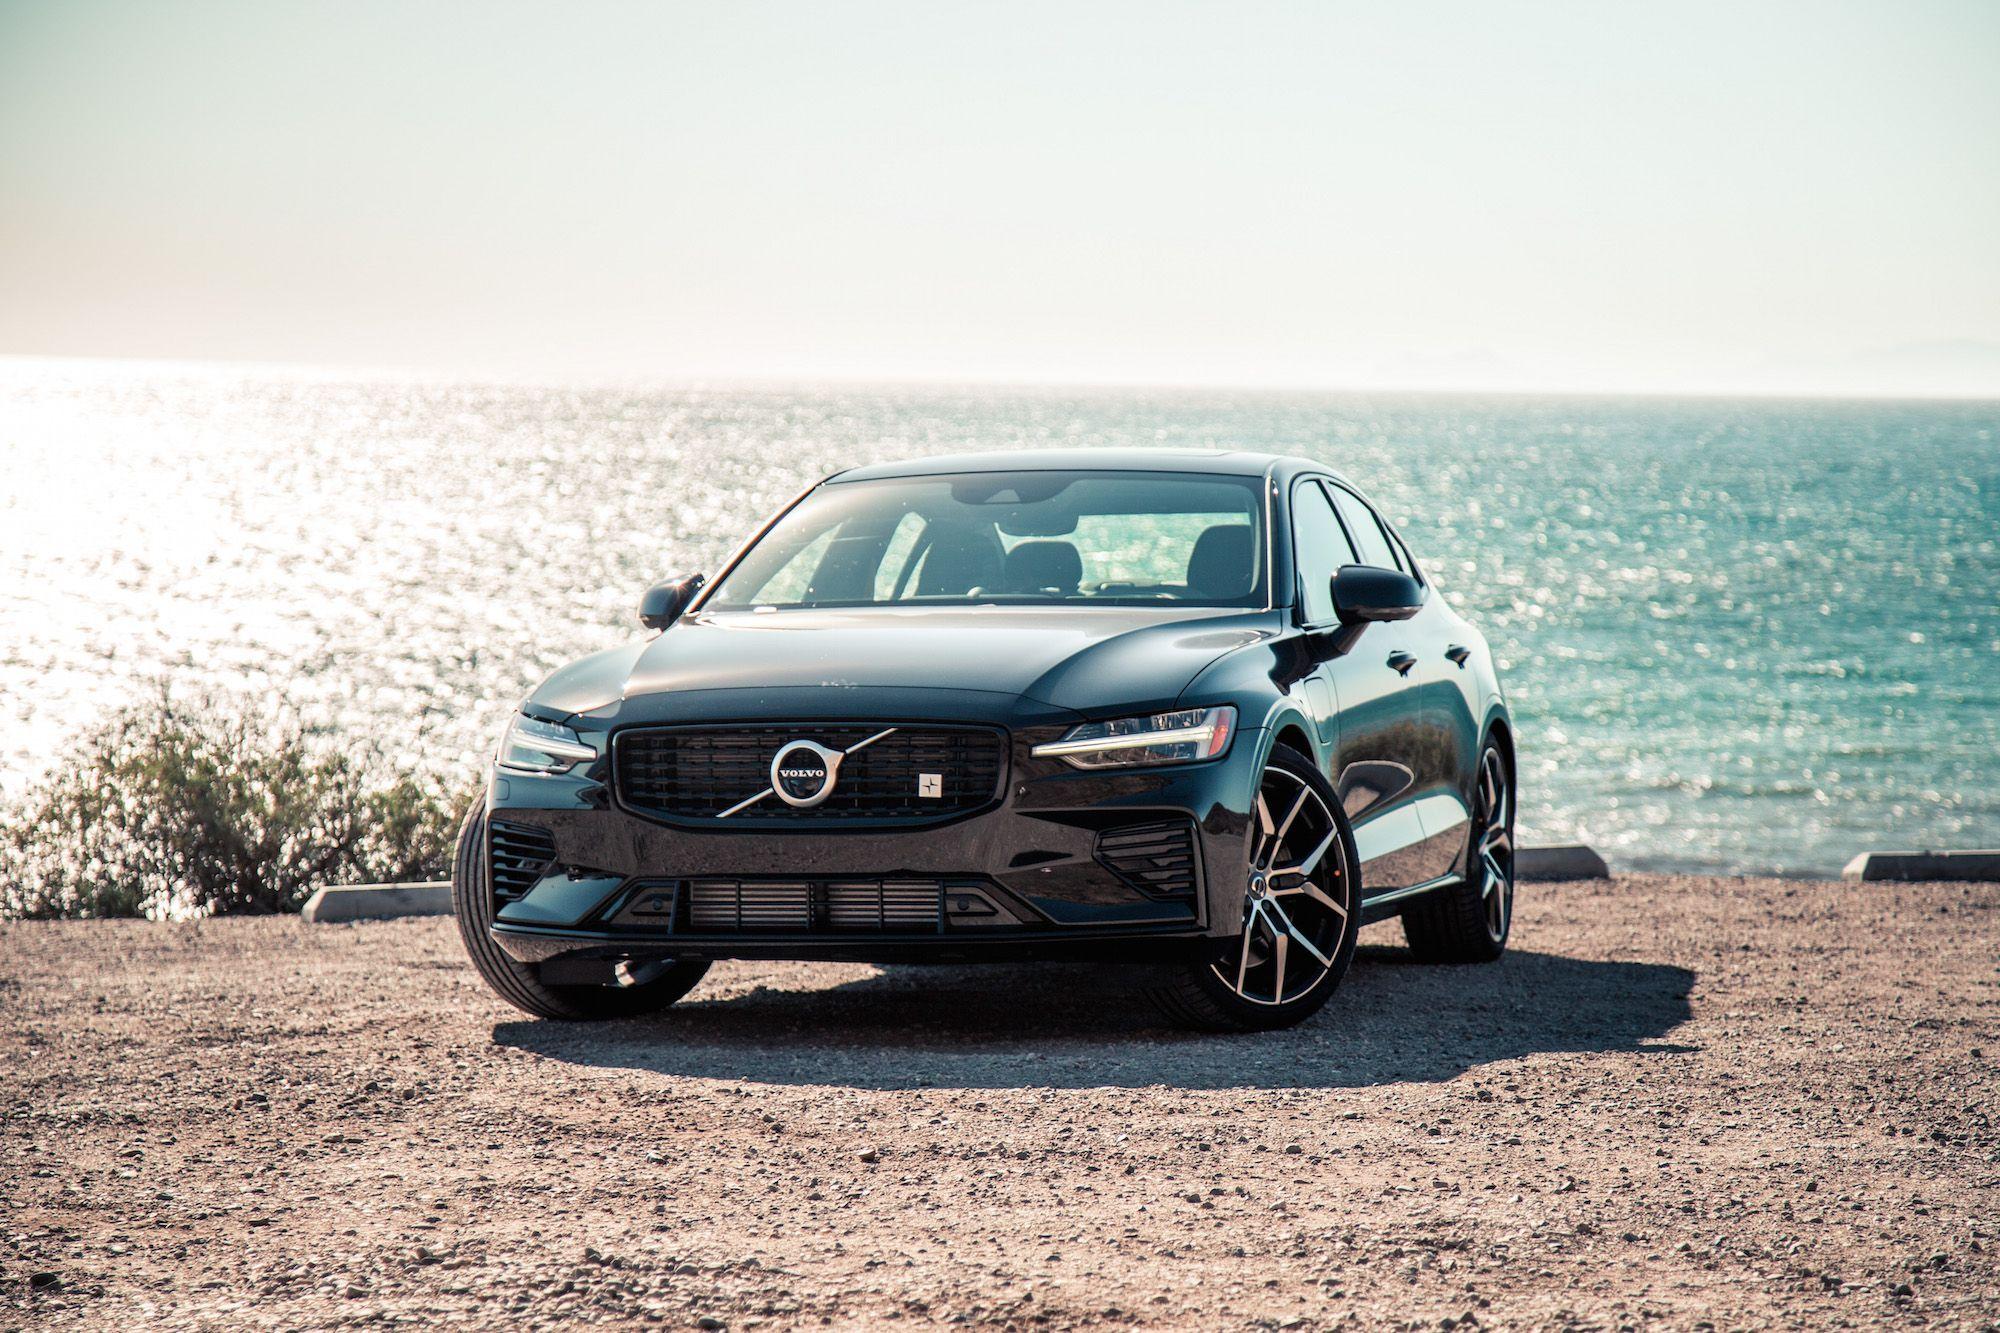 2020 Volvo S60 Polestar Price, Design and Review